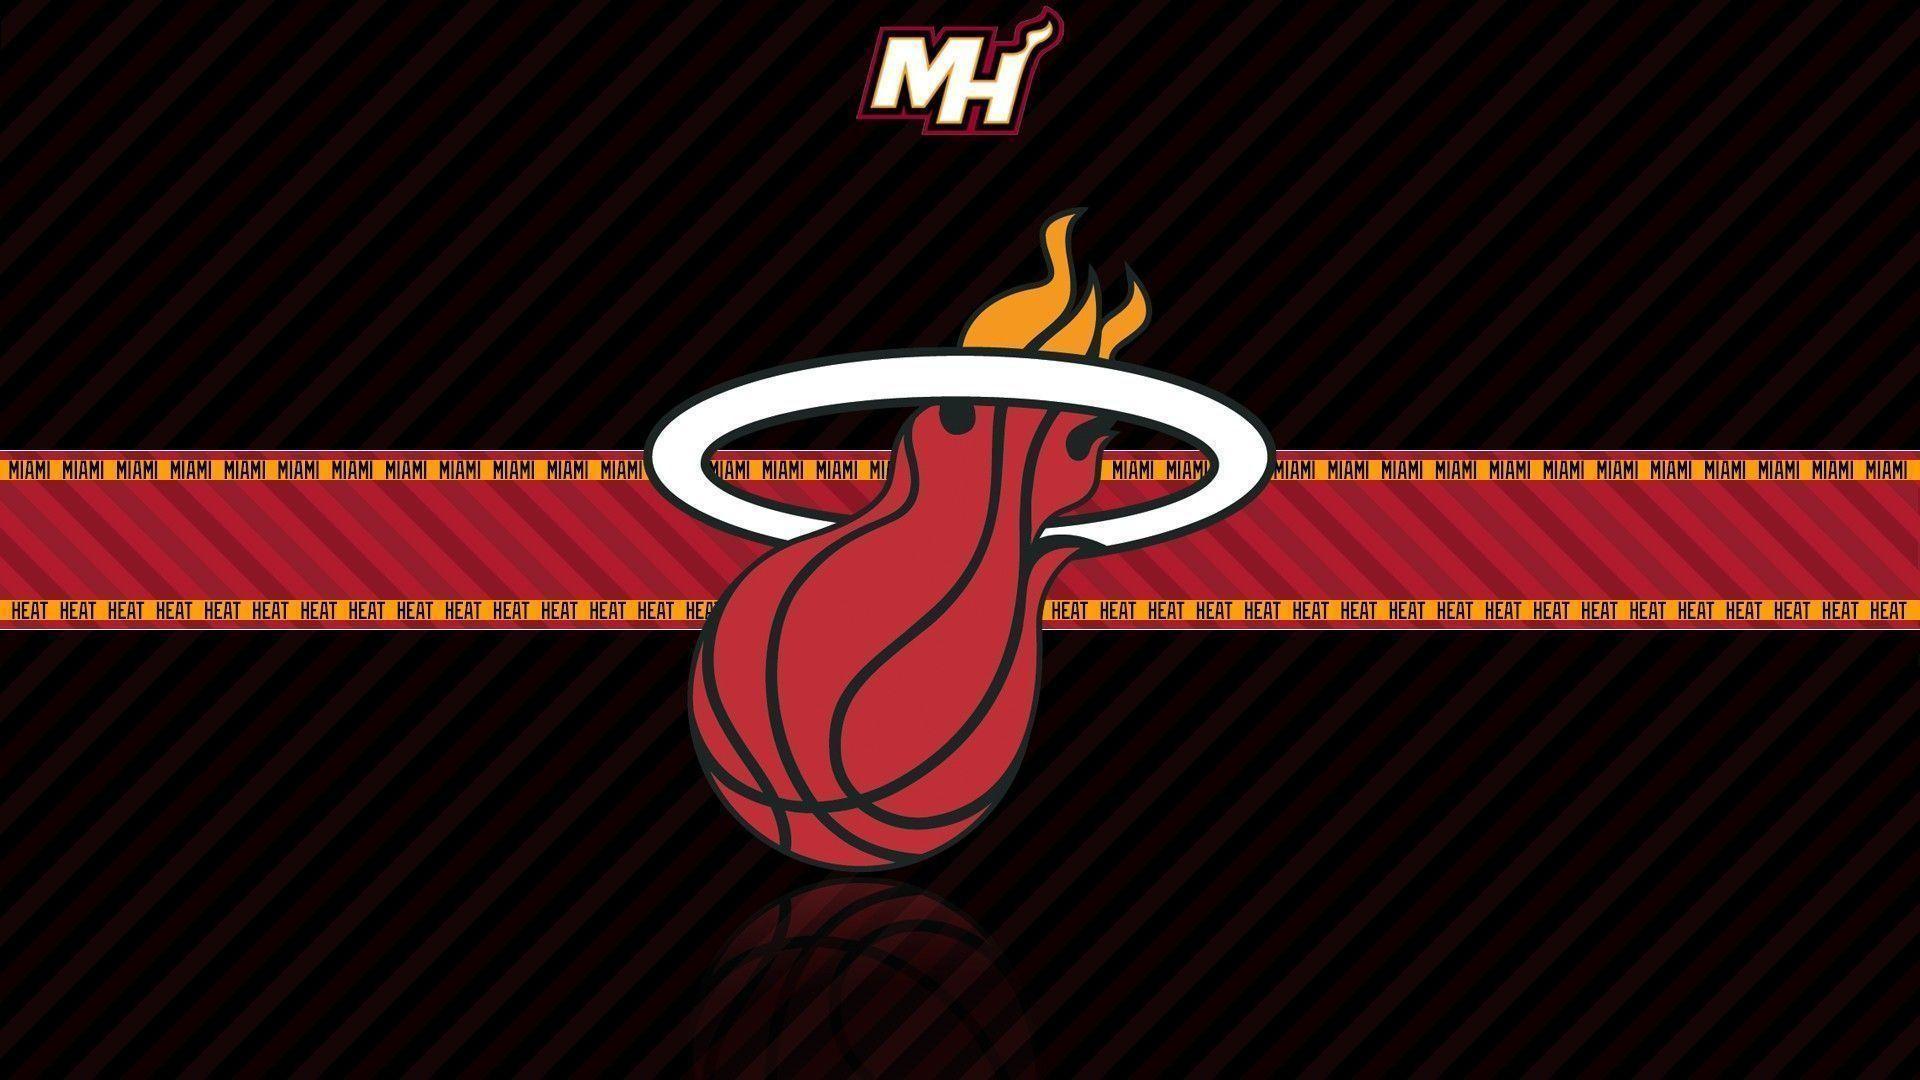 Miami Heat Logo Wallpaper 2018 183 ① Wallpapertag